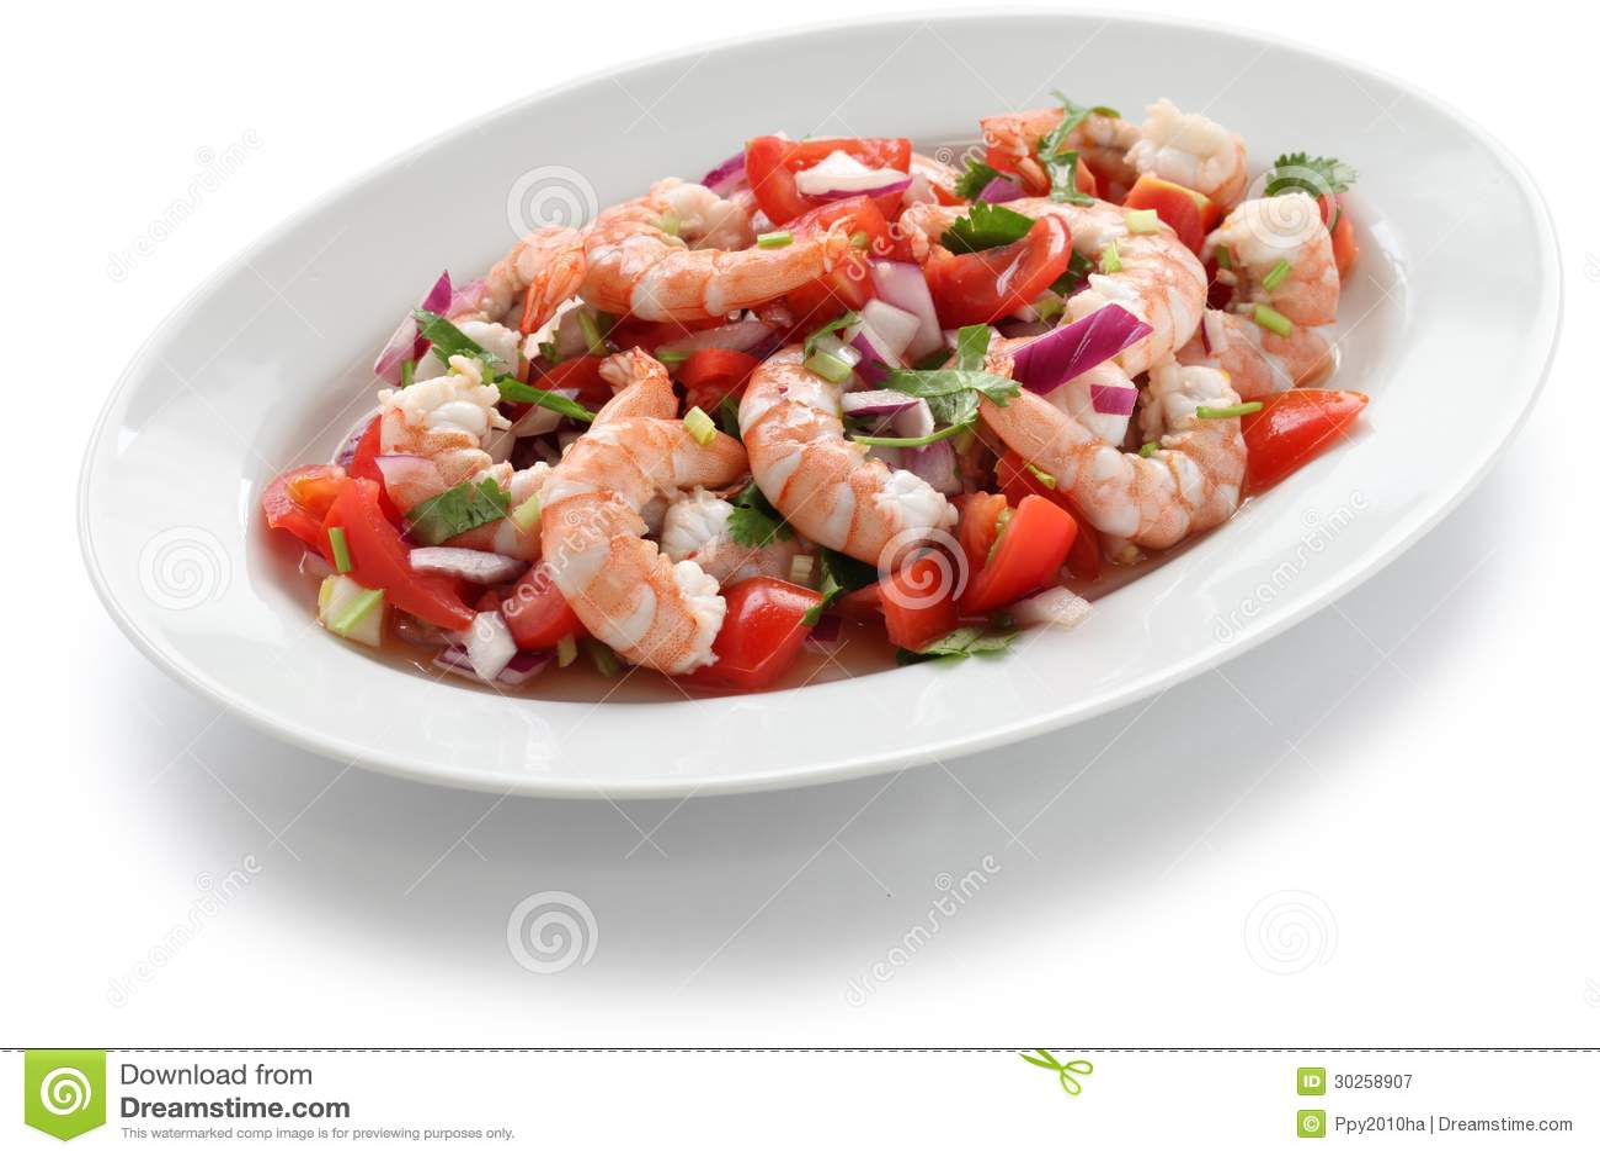 ceviche marinated seafood salad